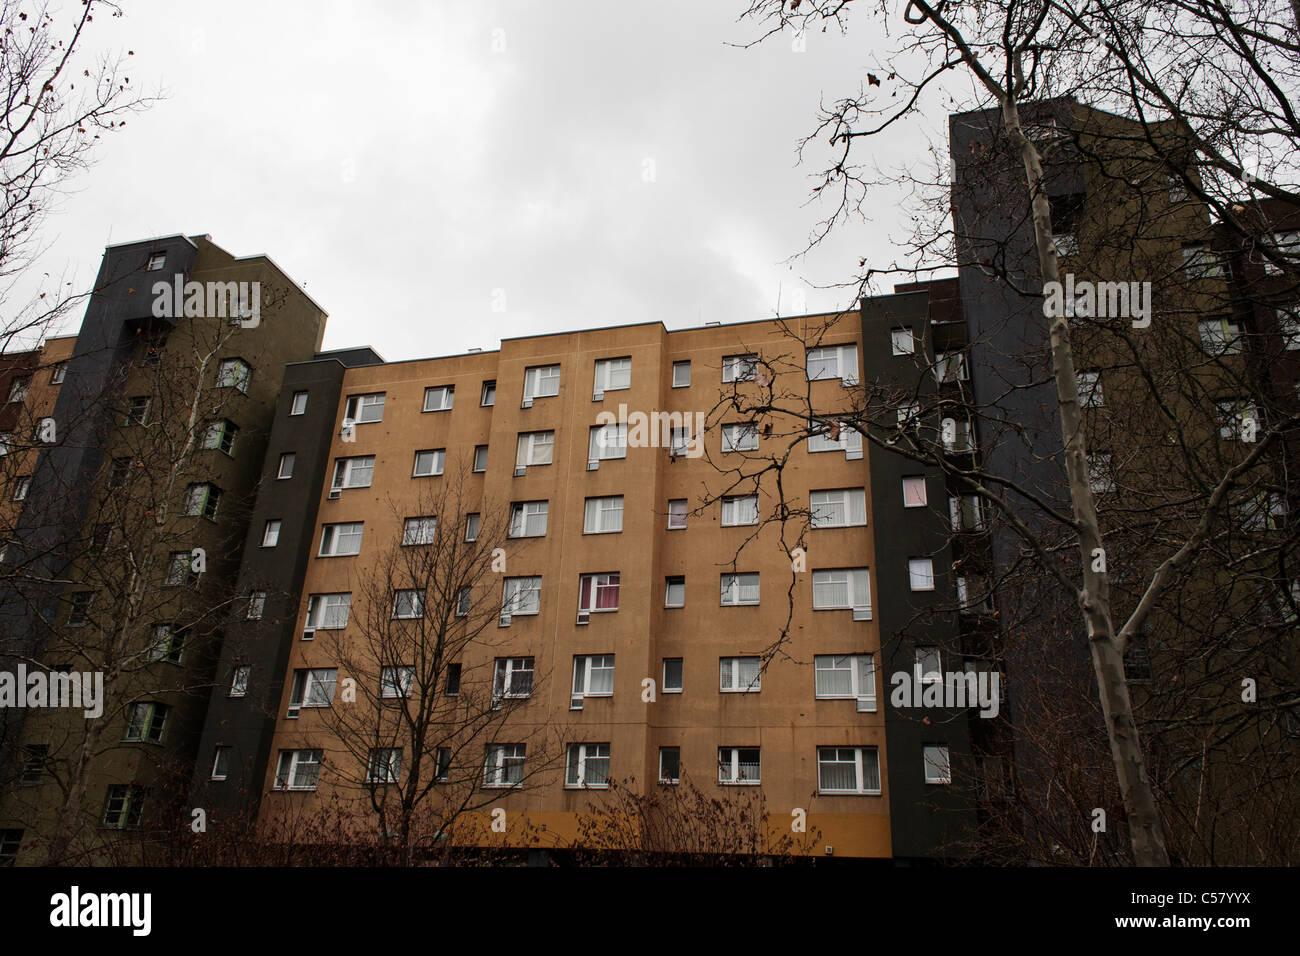 Social housing in Kreuzberg, Berlin, Germany. - Stock Image